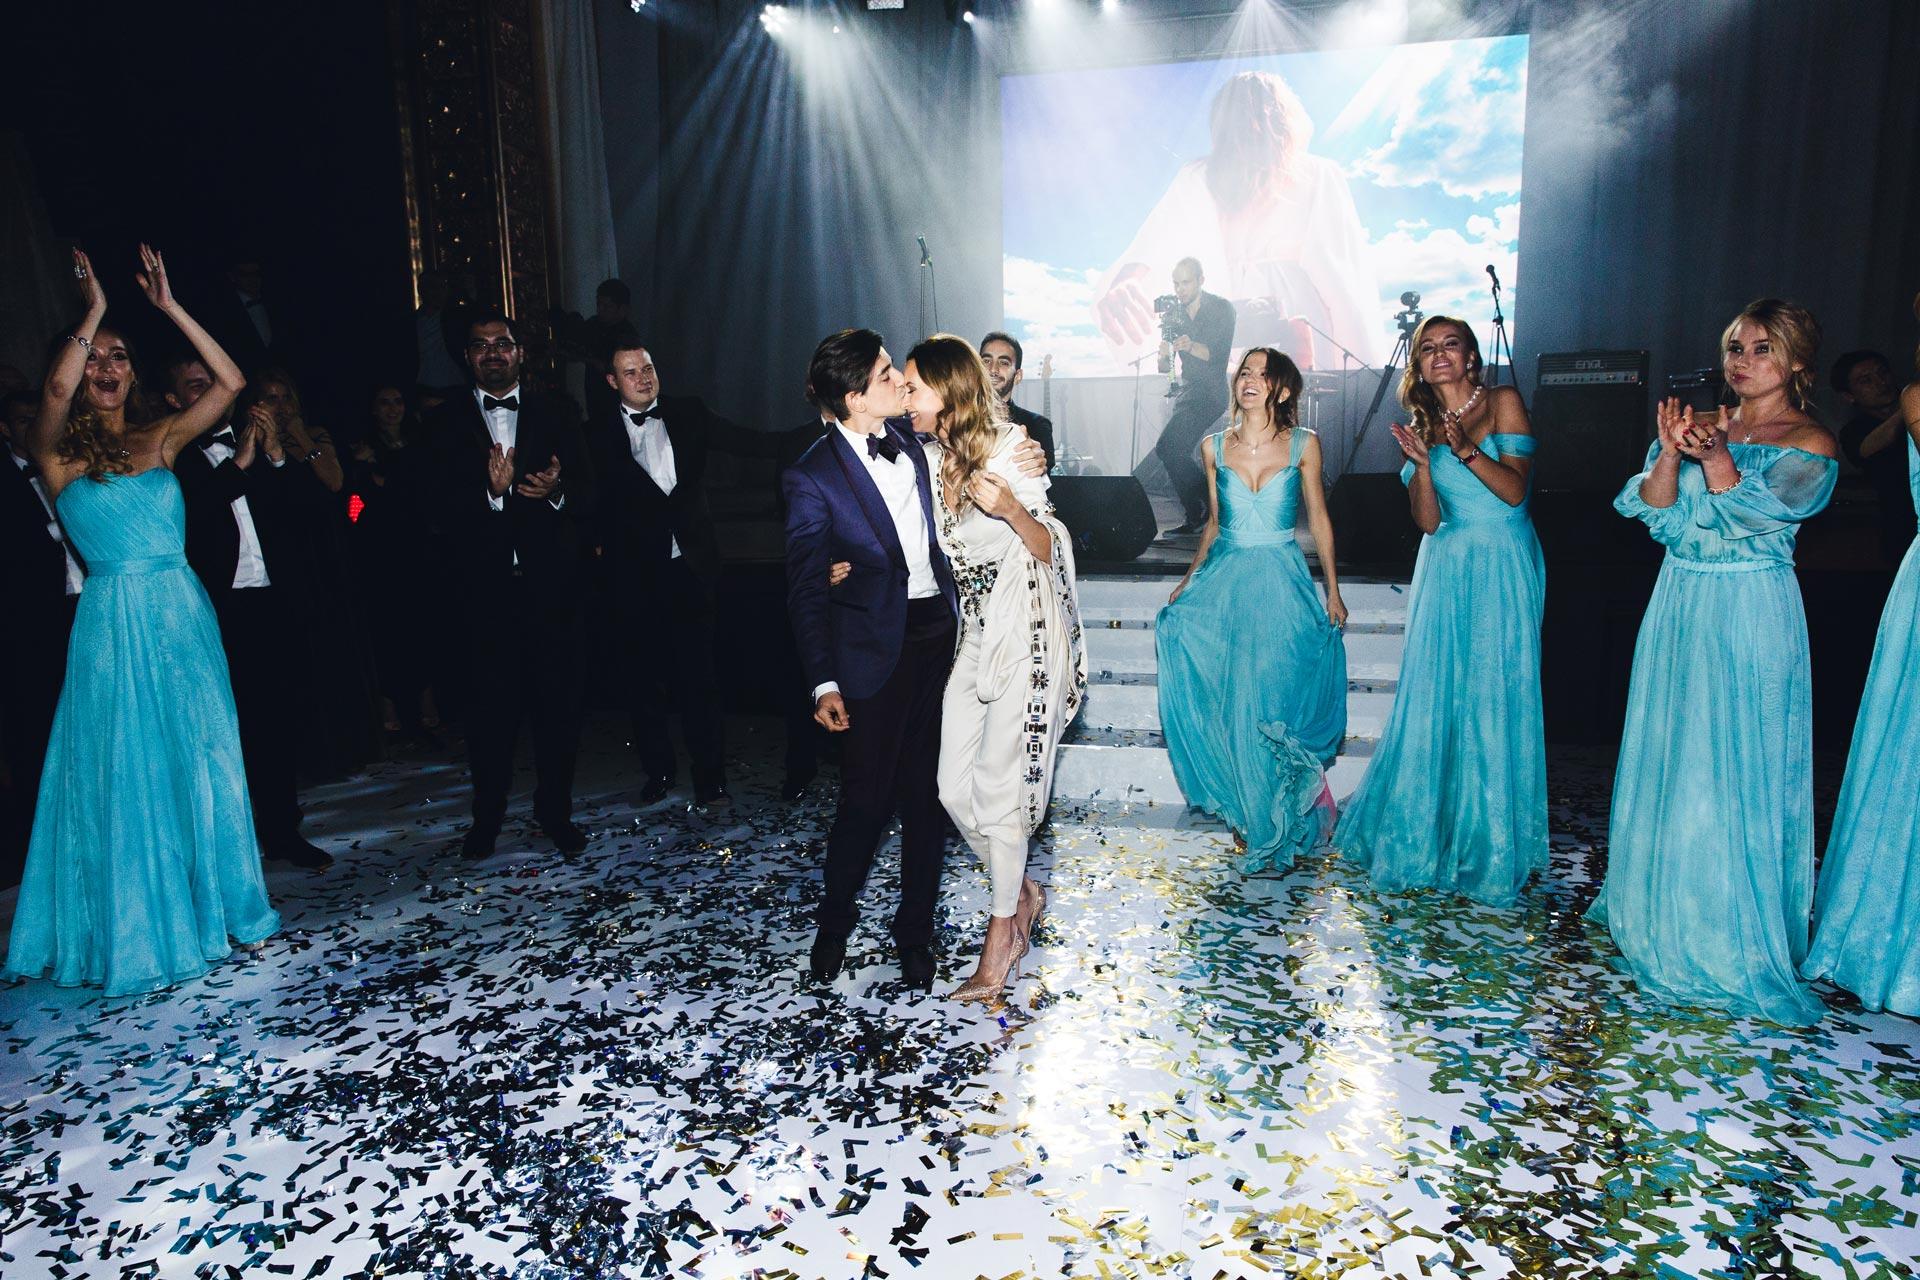 Follow me to. Свадьба Натальи и Мурада Османн фото 7